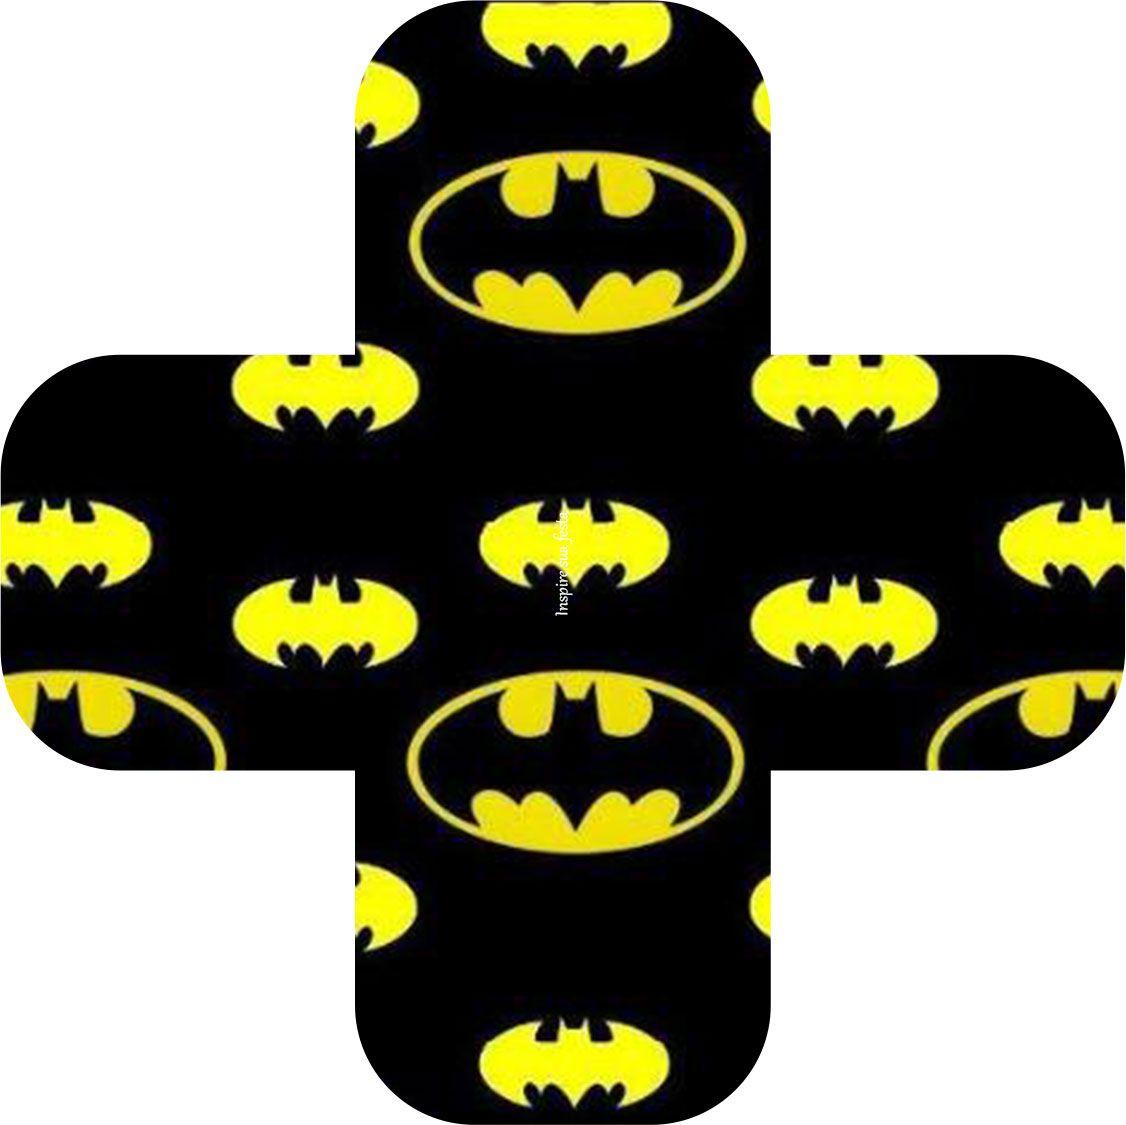 batman-party-printables-018.jpg (1126×1125)